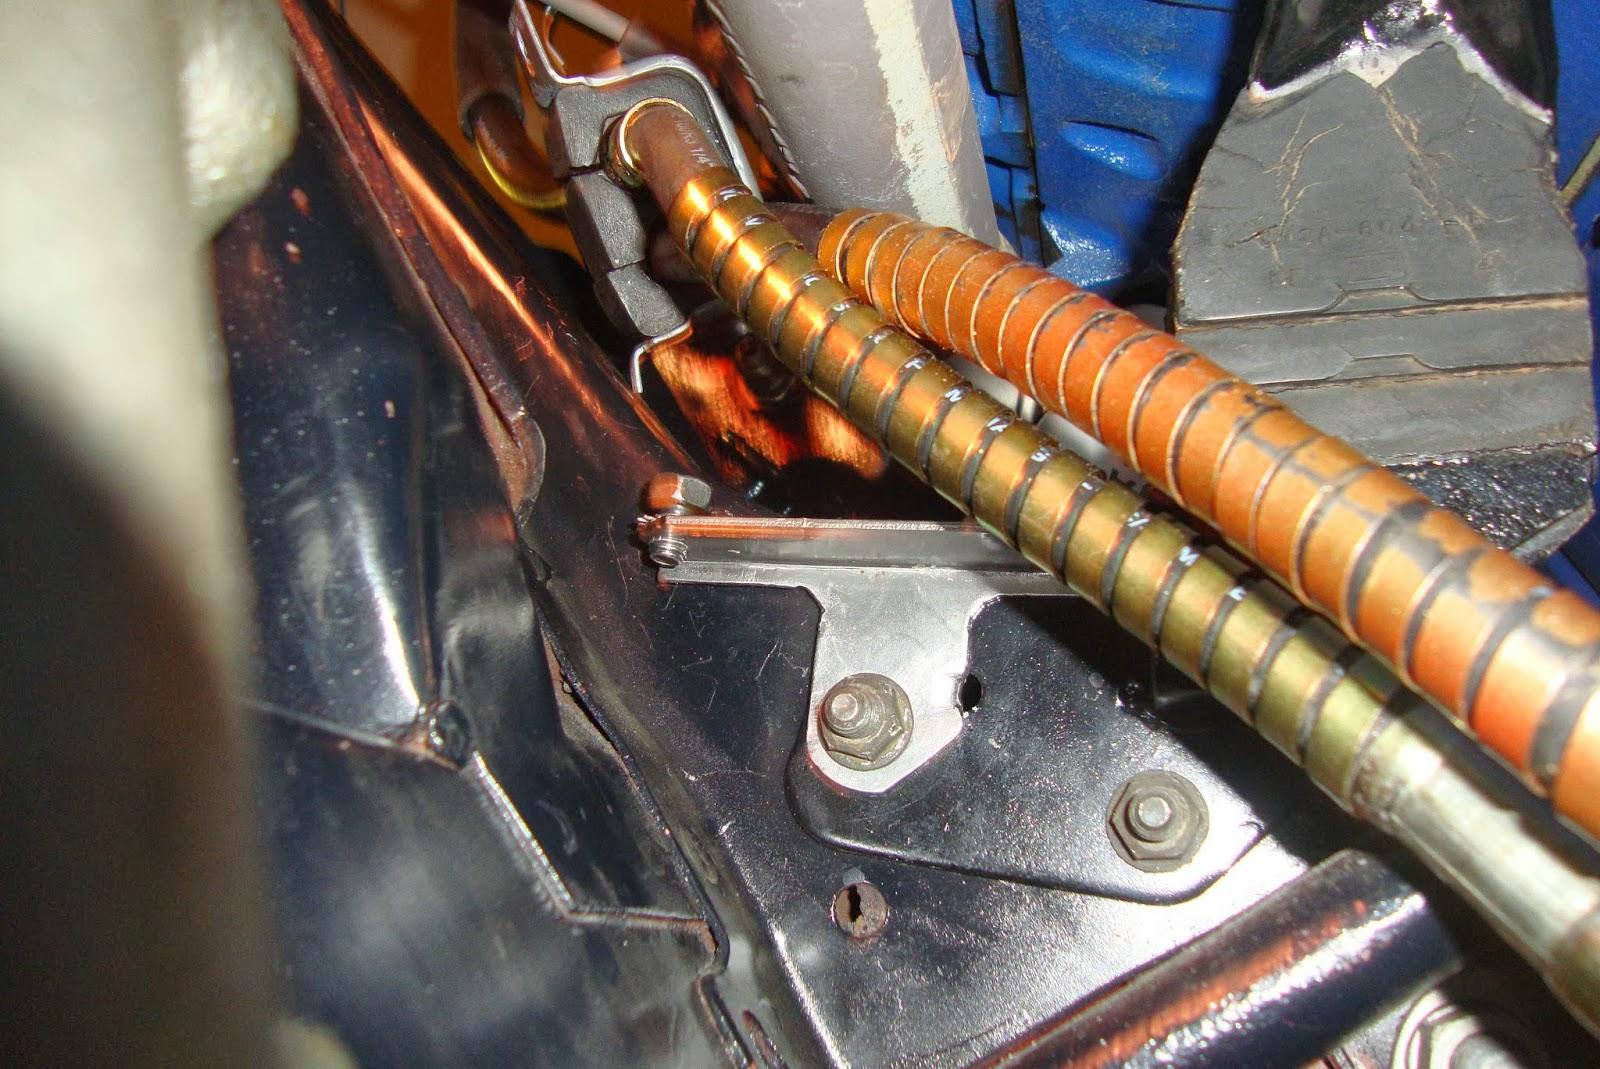 1967 Mustang Power Steering Hose Routing